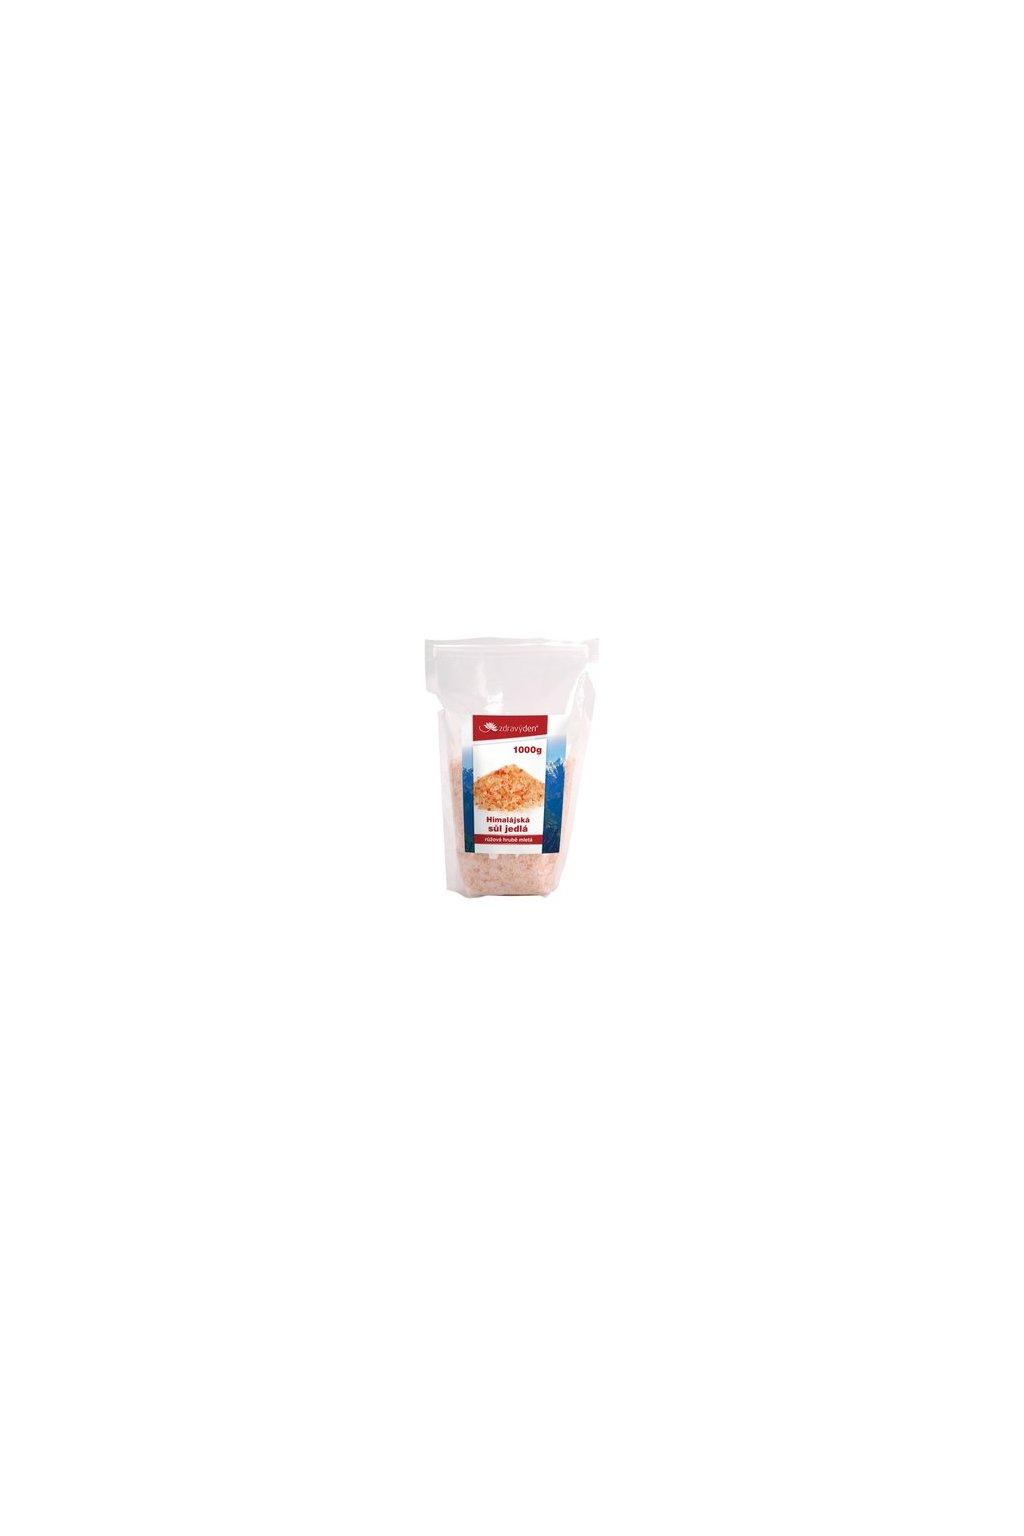 sul himalajska jedla ruzova hrube mleta.jpg 207x317 q85 subsampling 2[1]